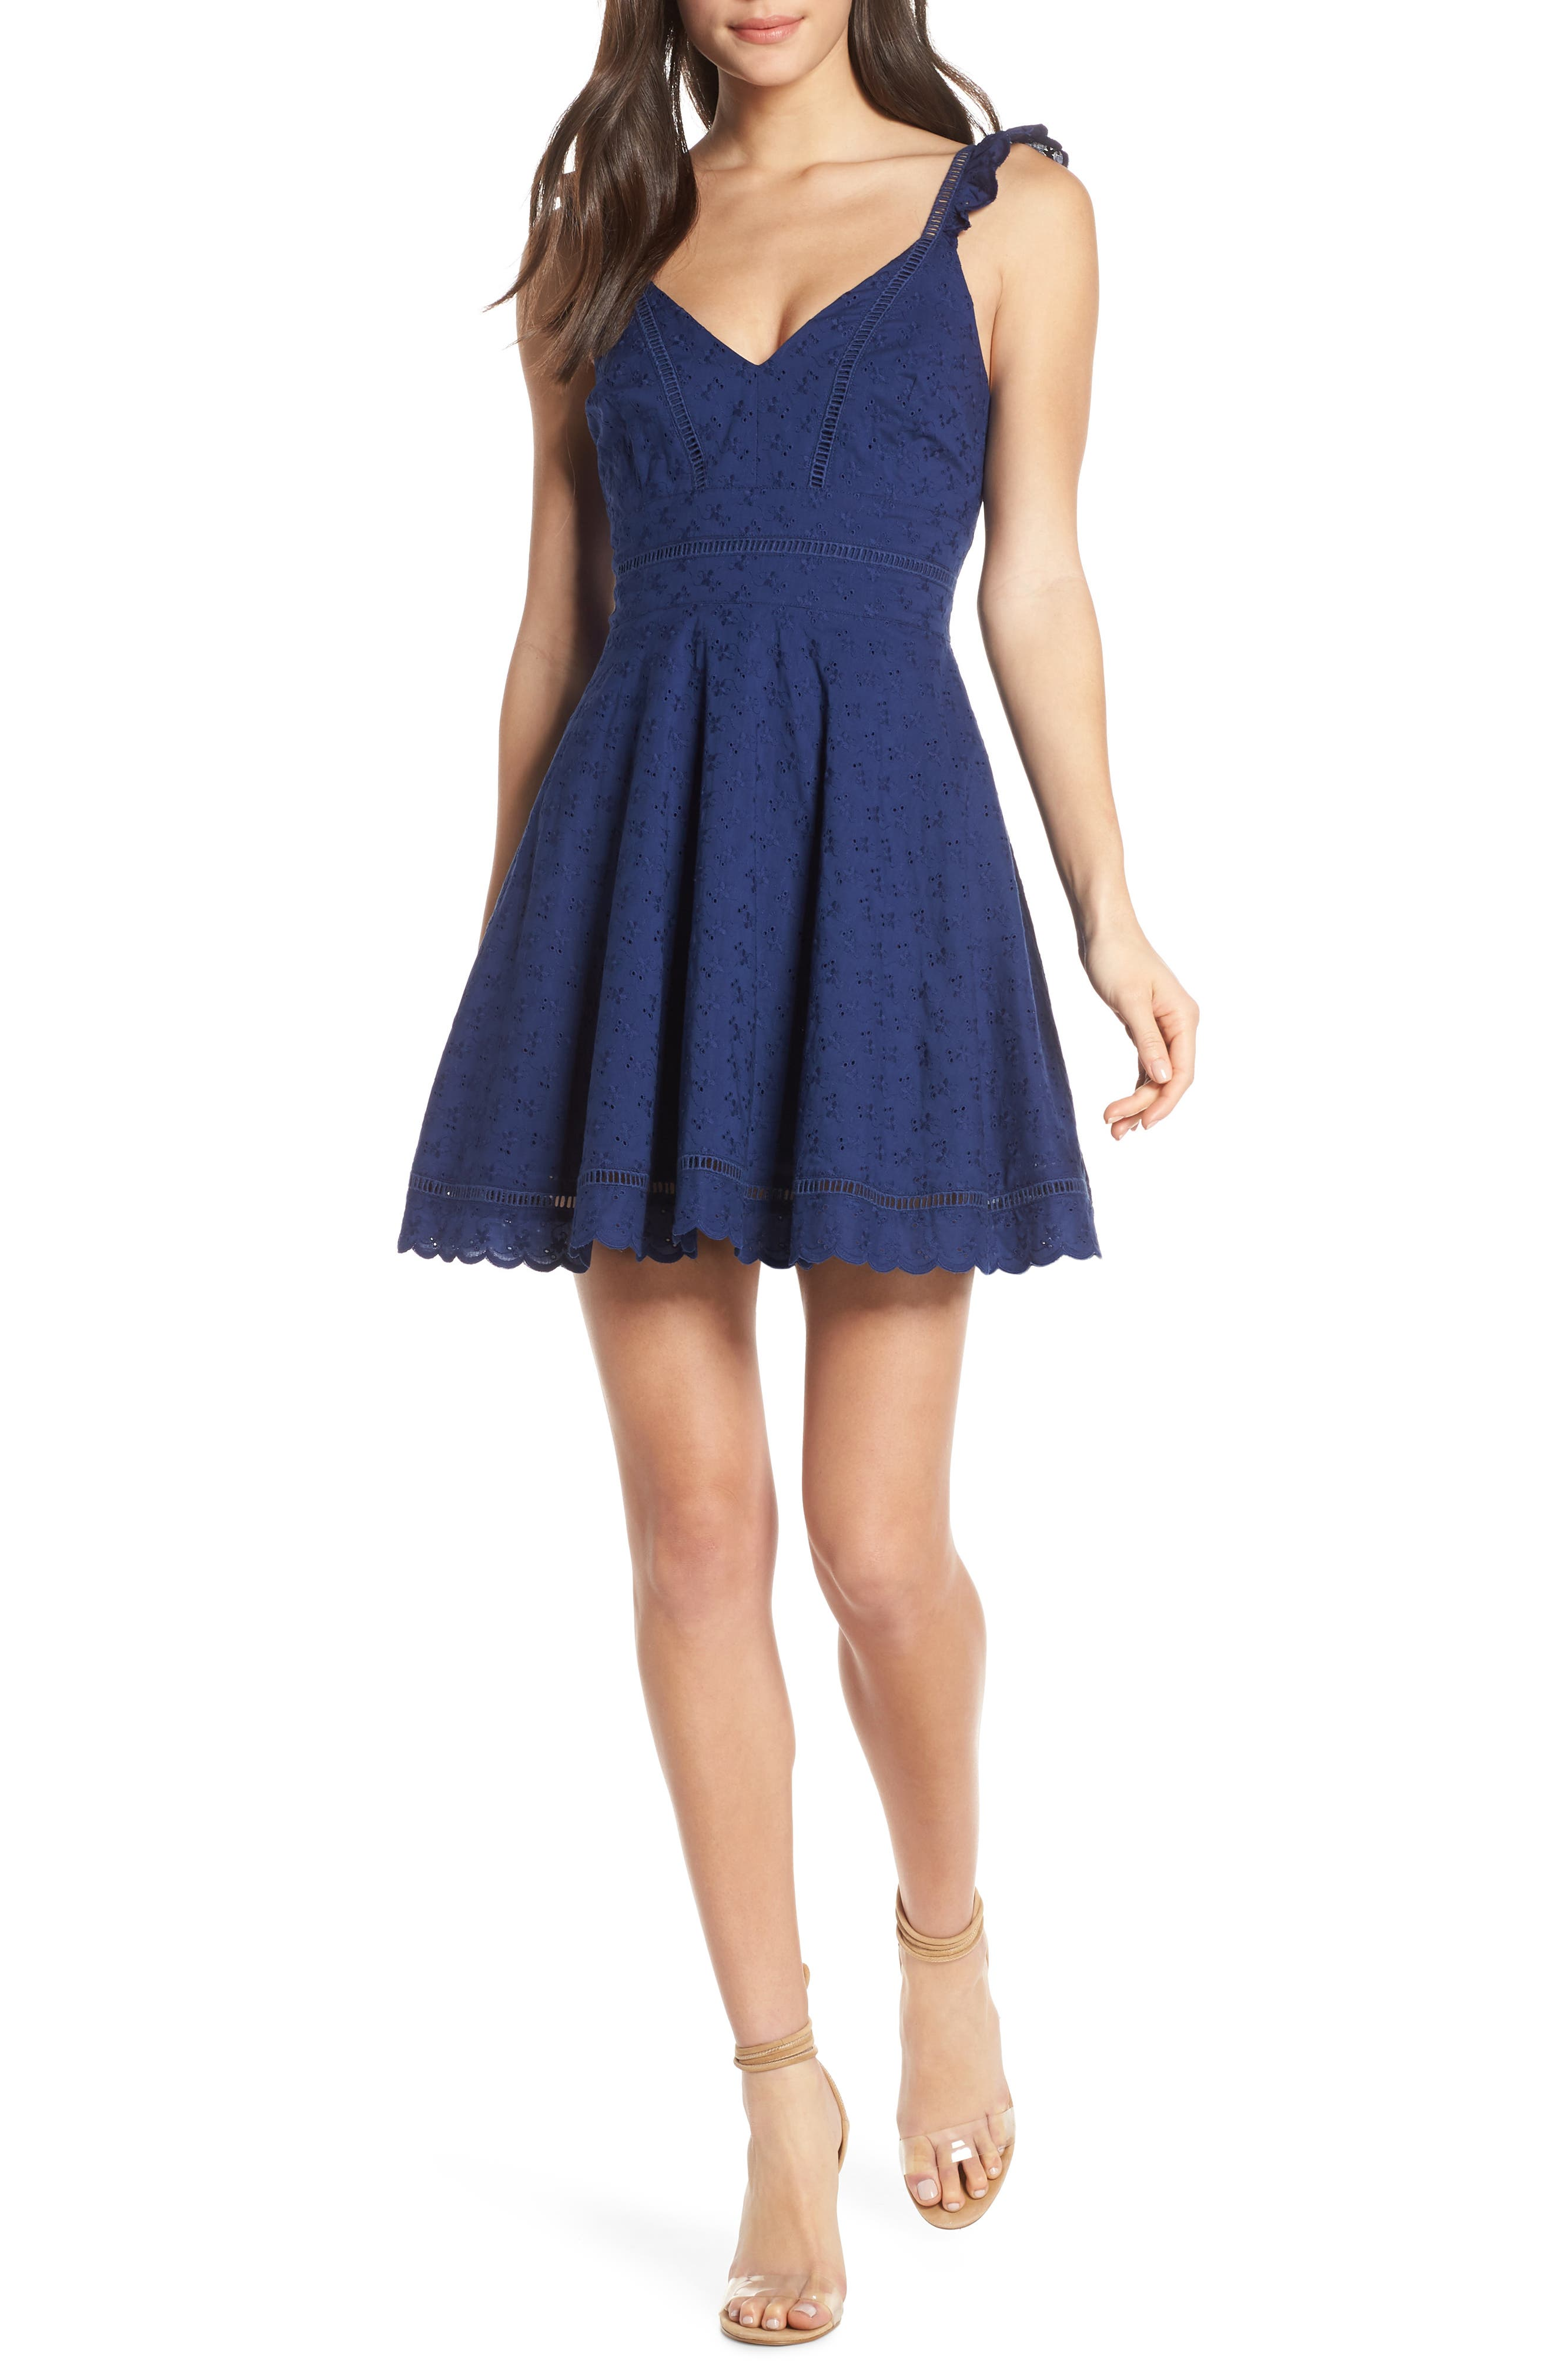 Bb Dakota Eyelet You Win Fit & Flare Dress, Blue